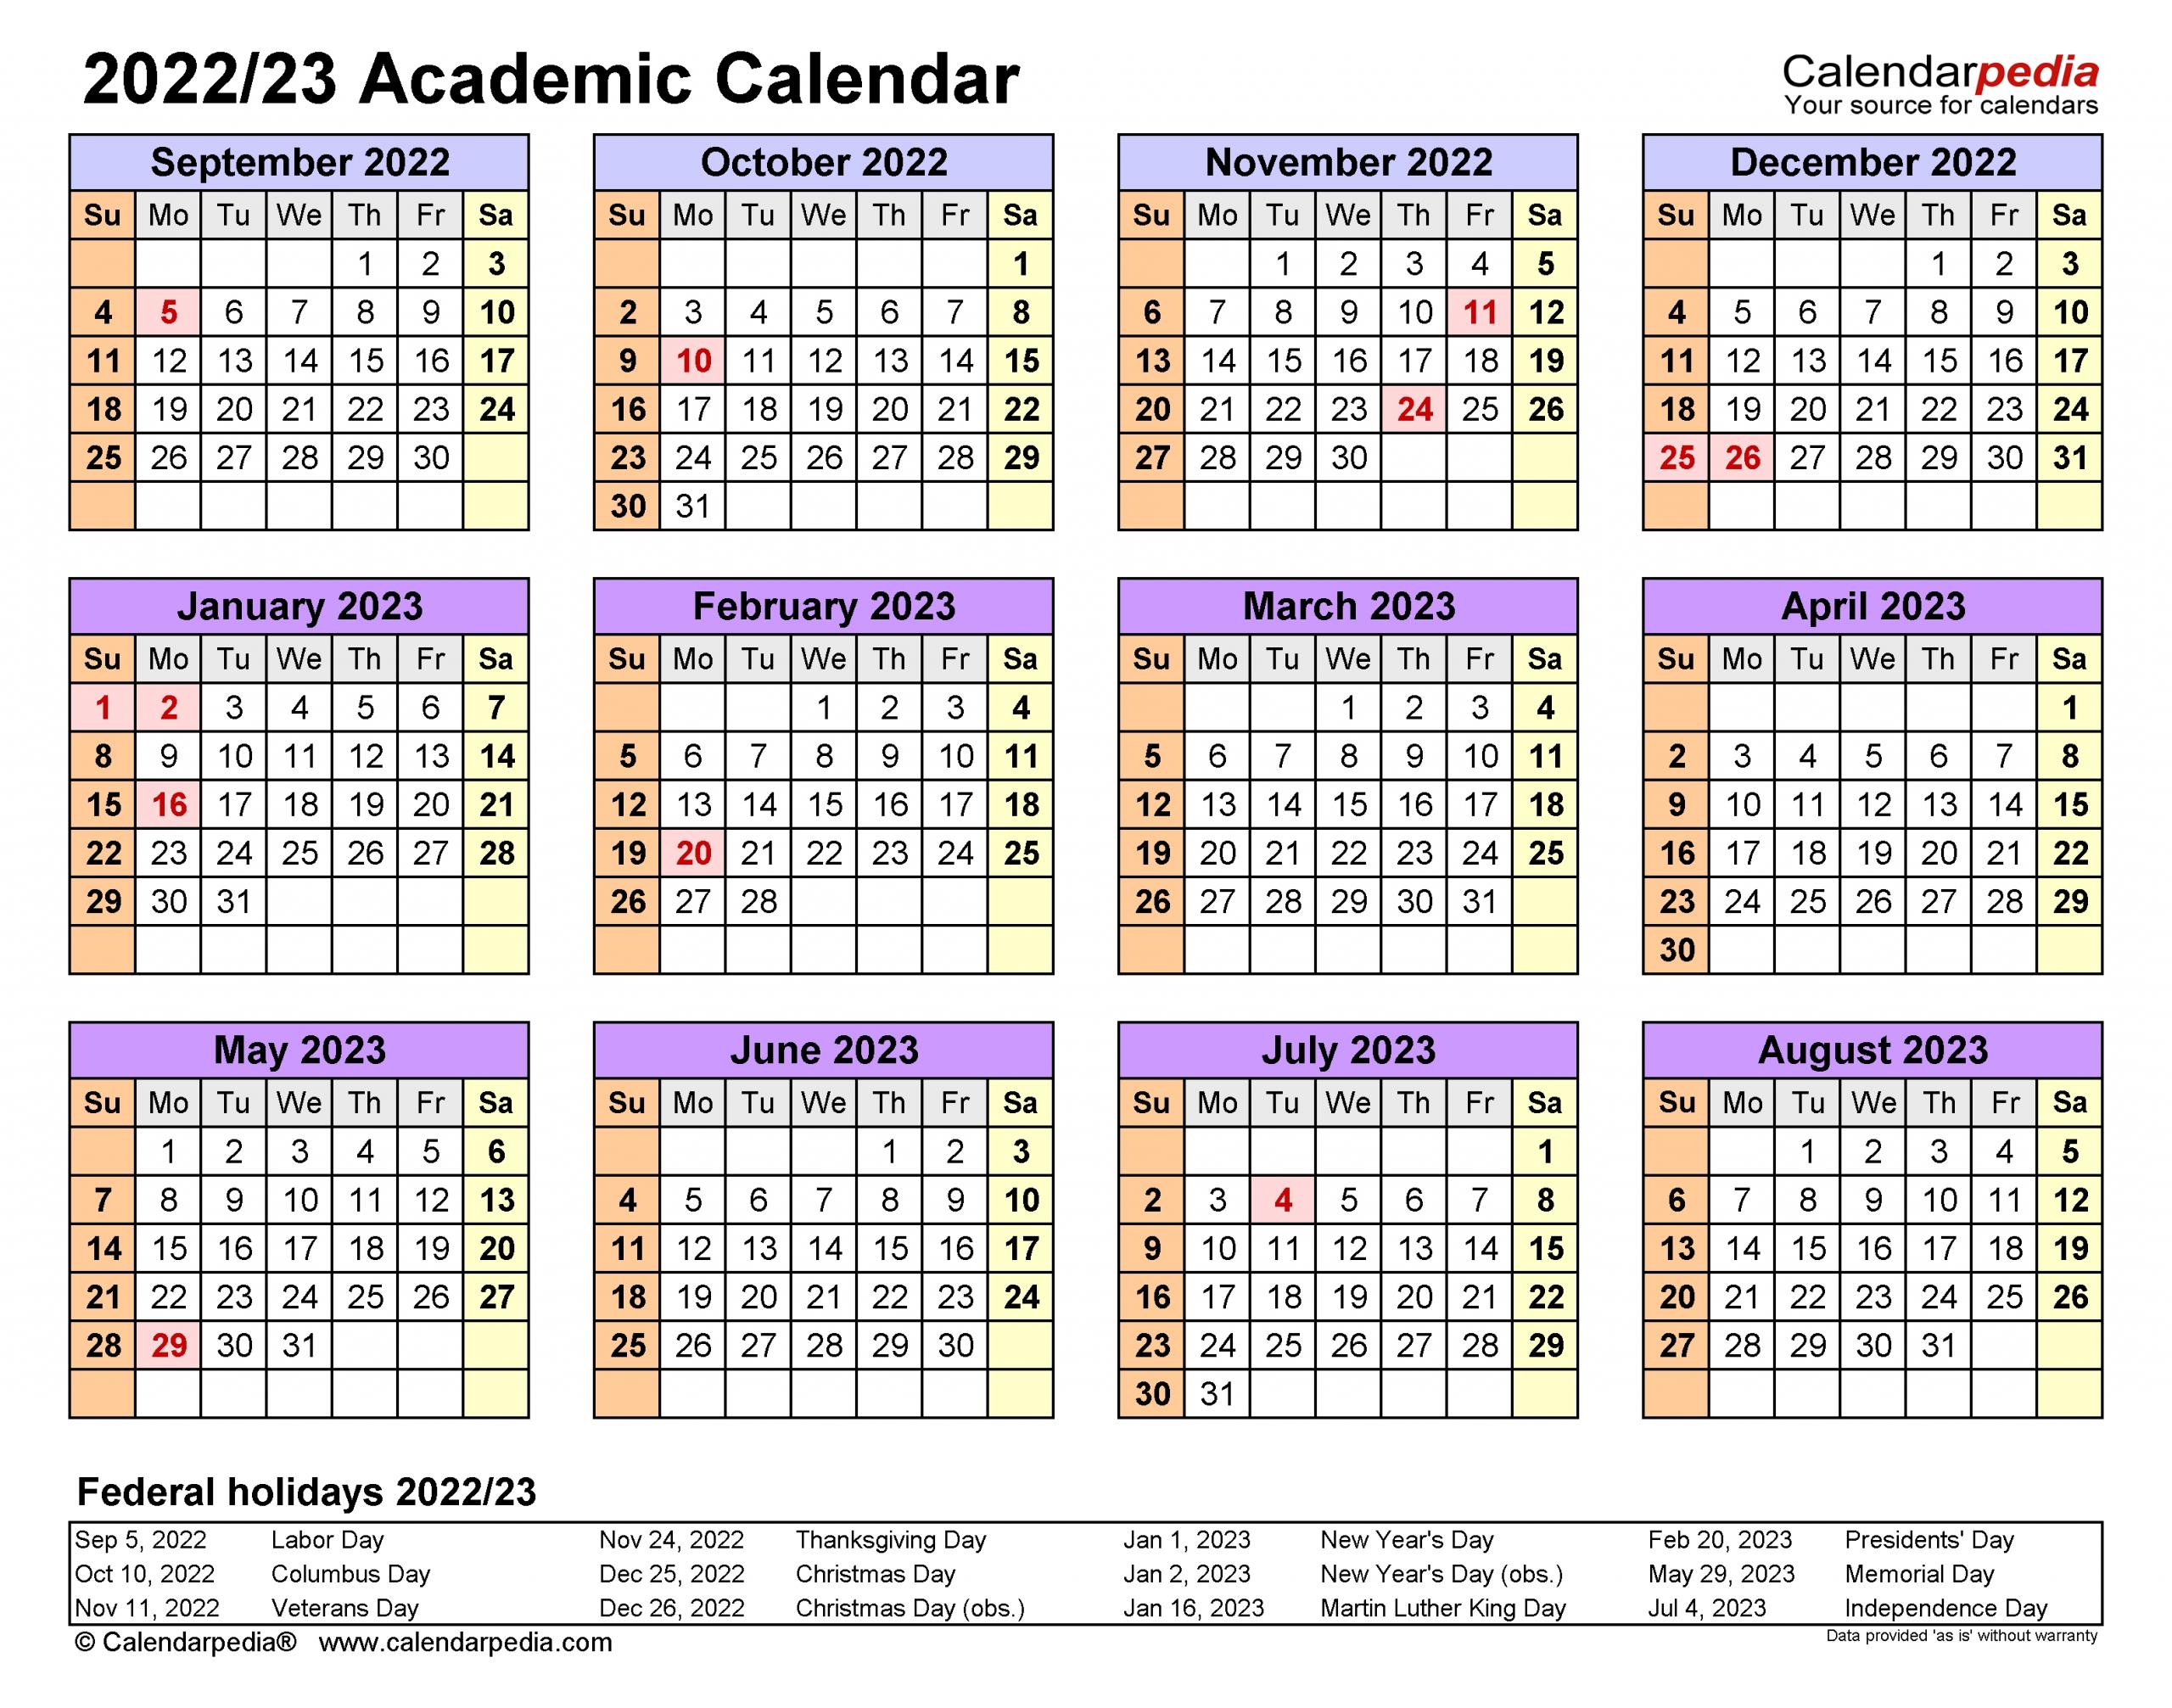 Academic Calendars 2022/2023 - Free Printable Excel Templates